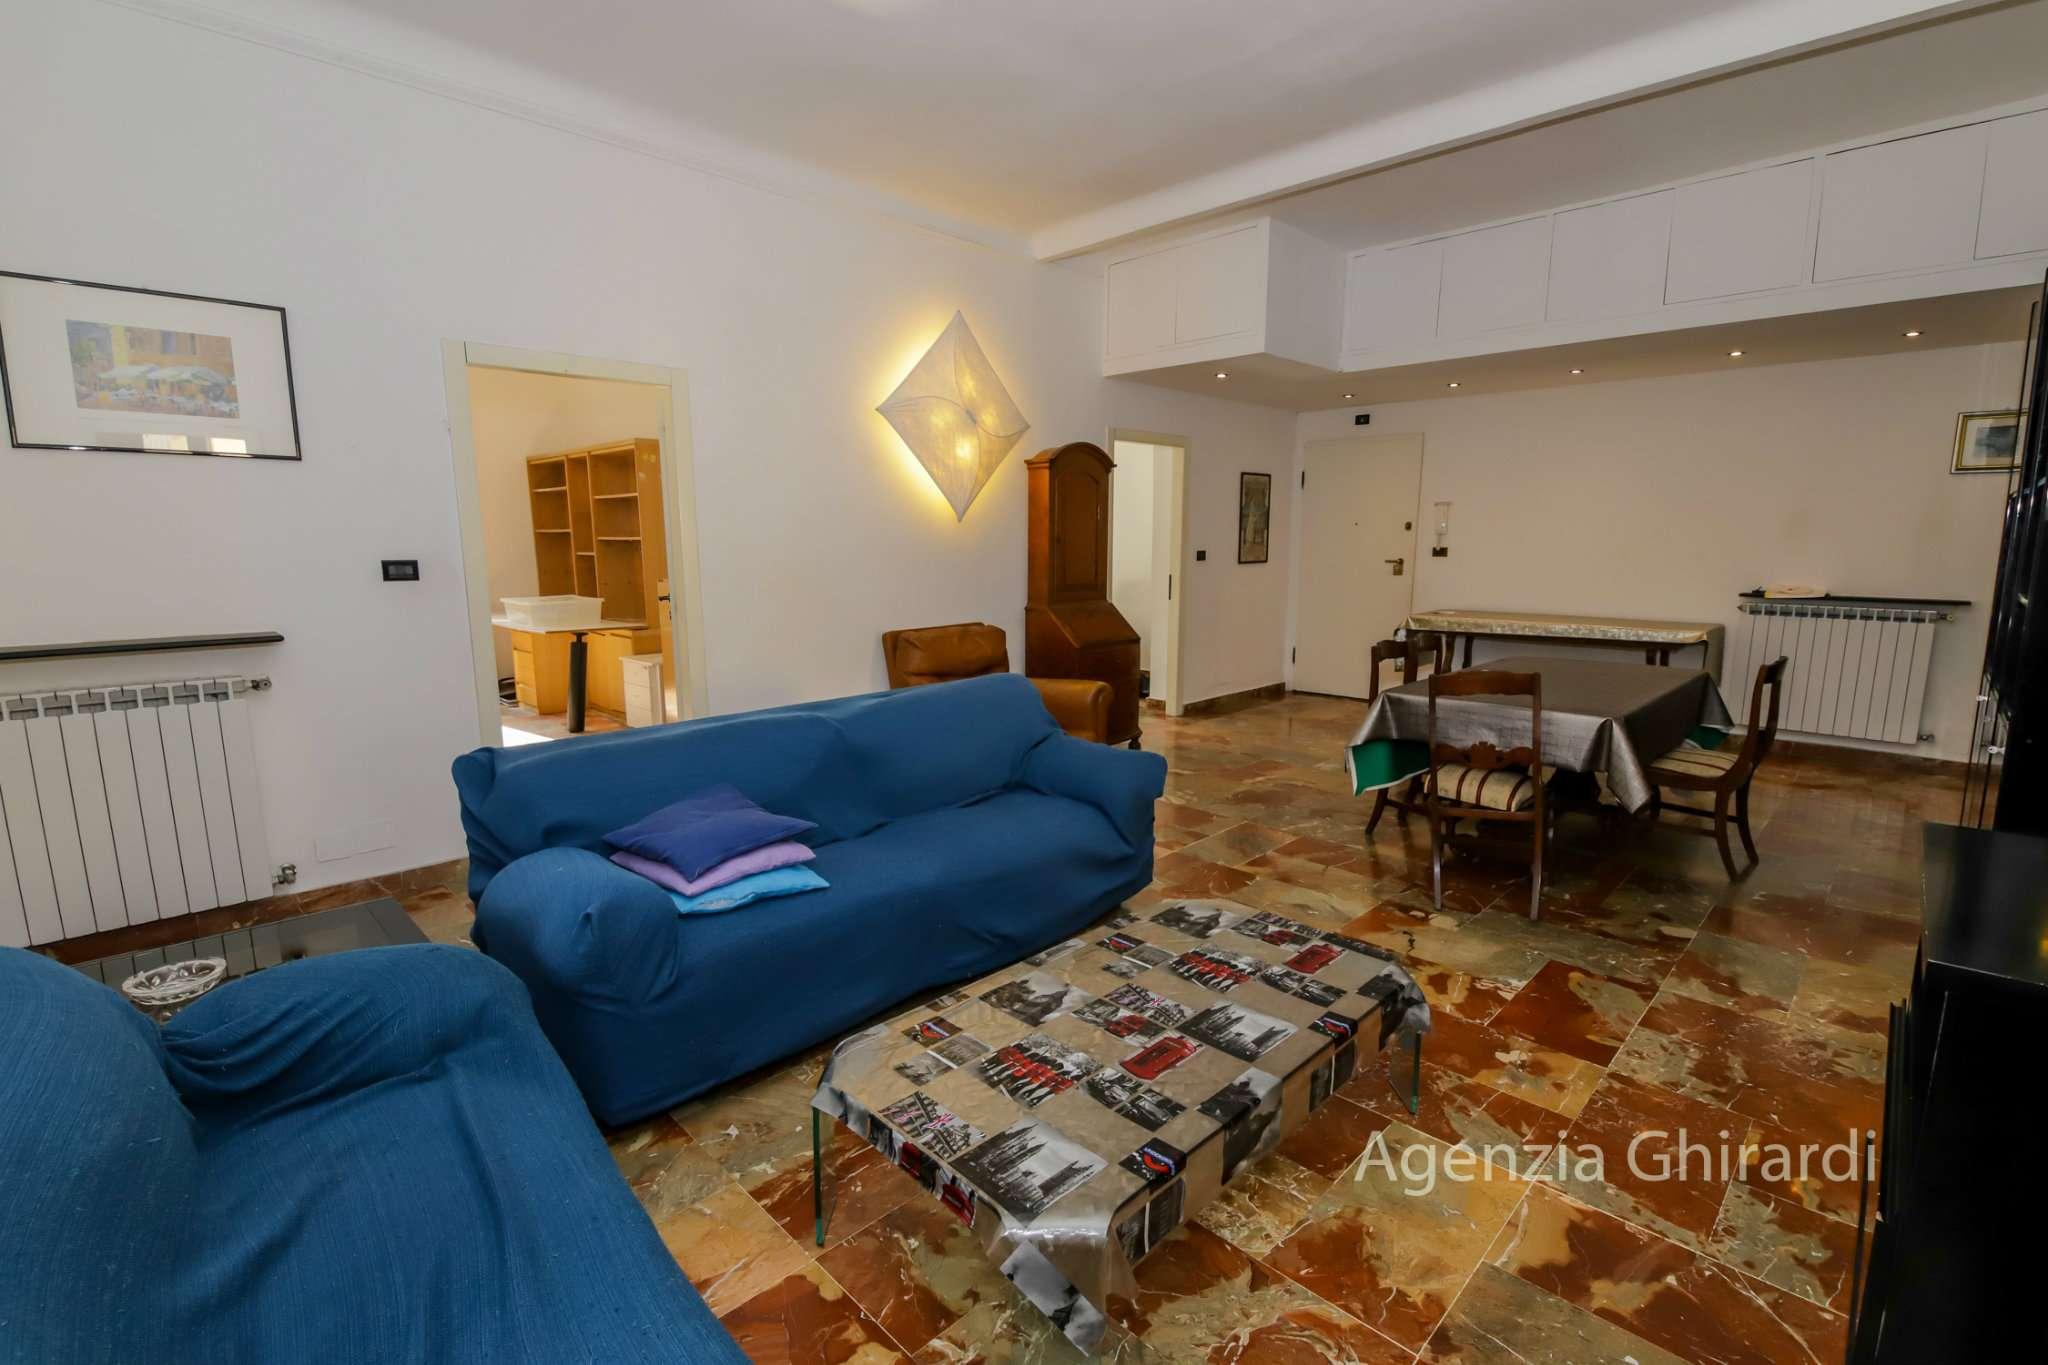 Foto 1 di Appartamento via Giuseppe Biancheri 11, Genova (zona Sestri Ponente)